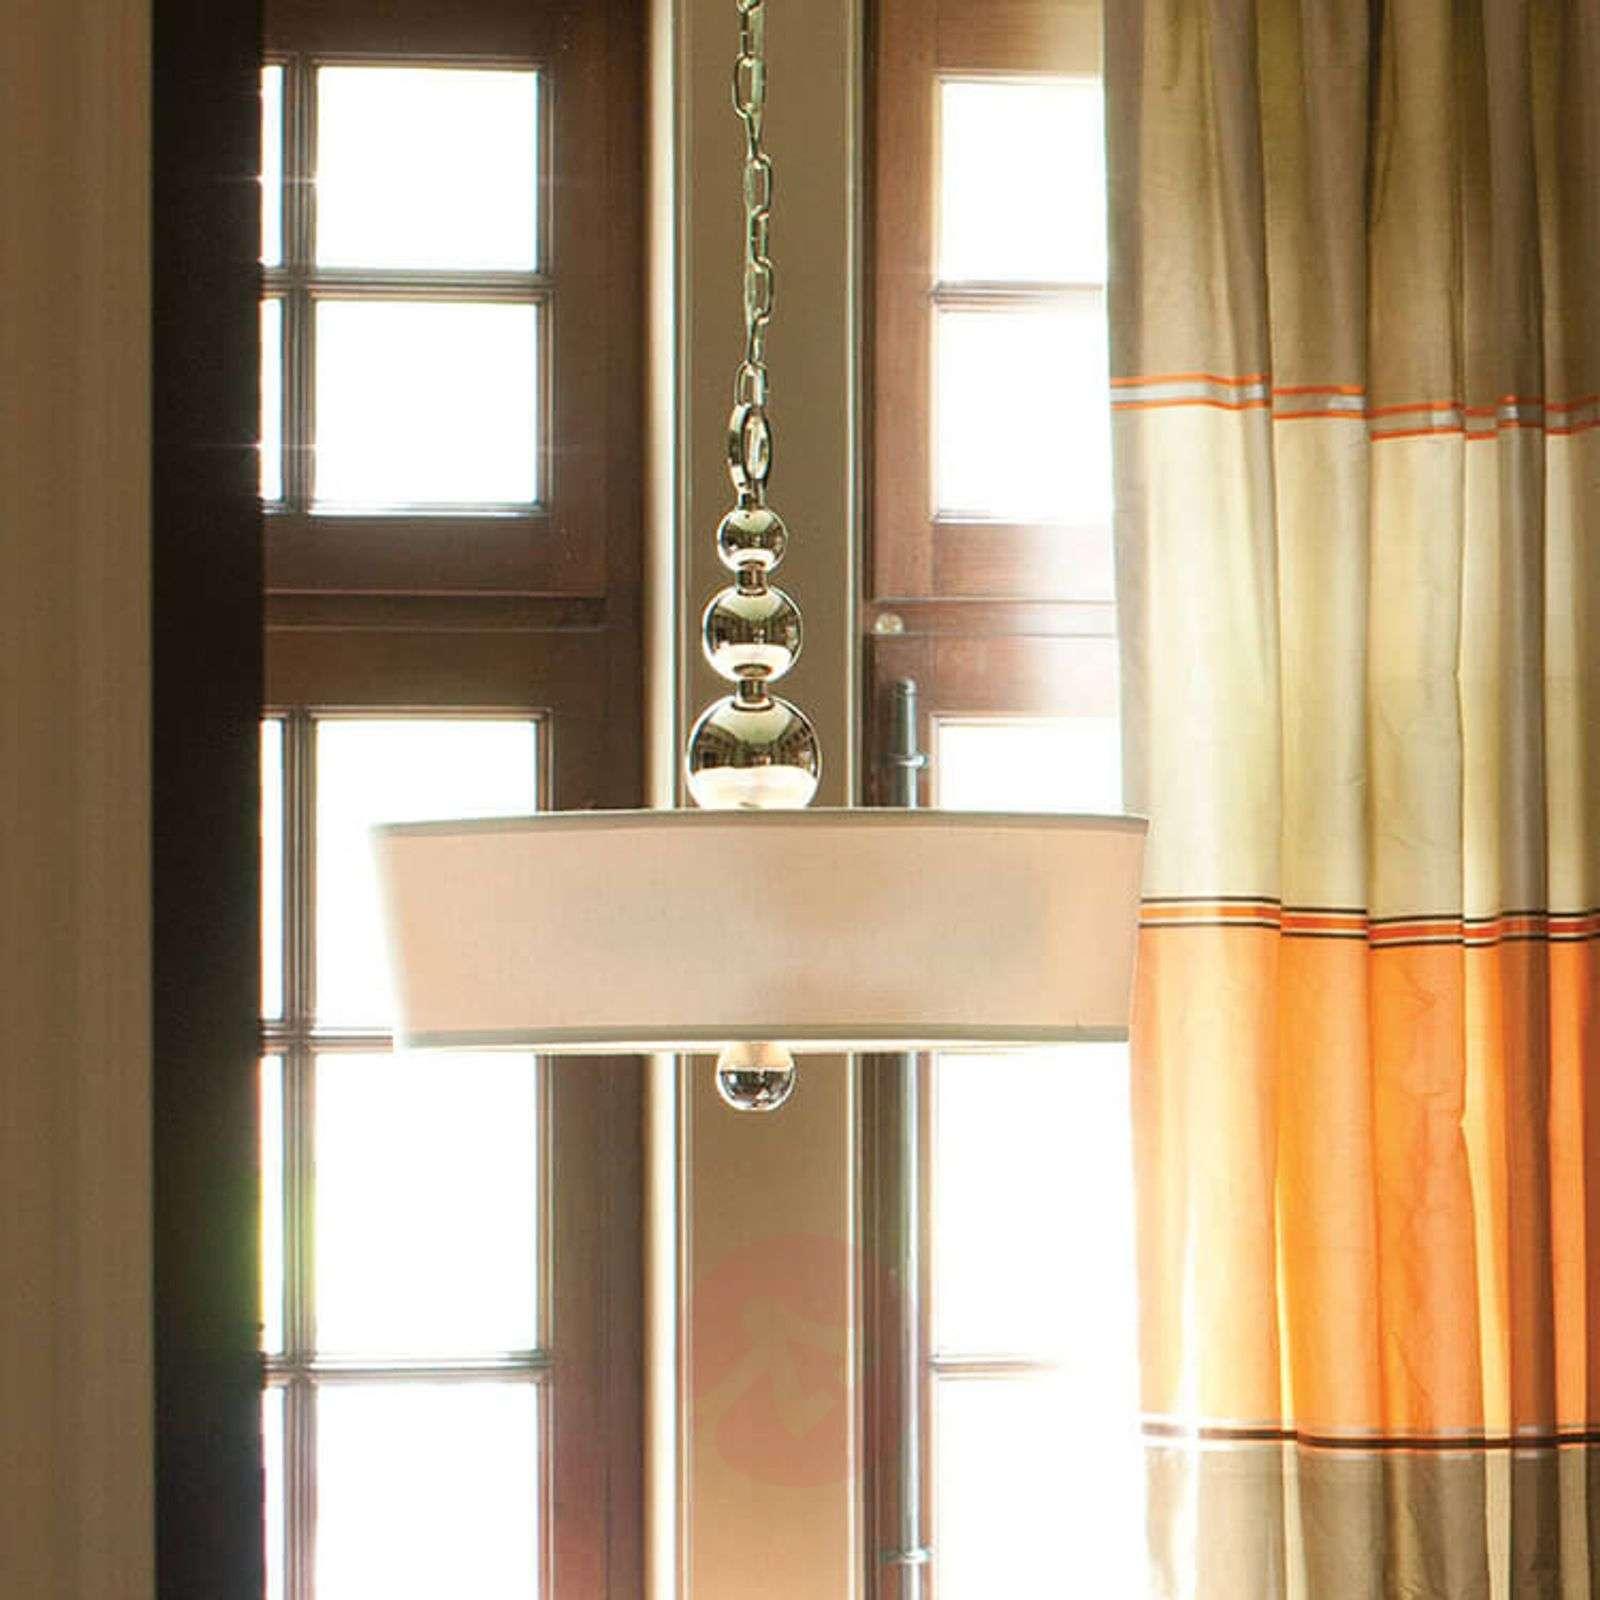 Fantastic hanging lamp Zelda-3048476-01